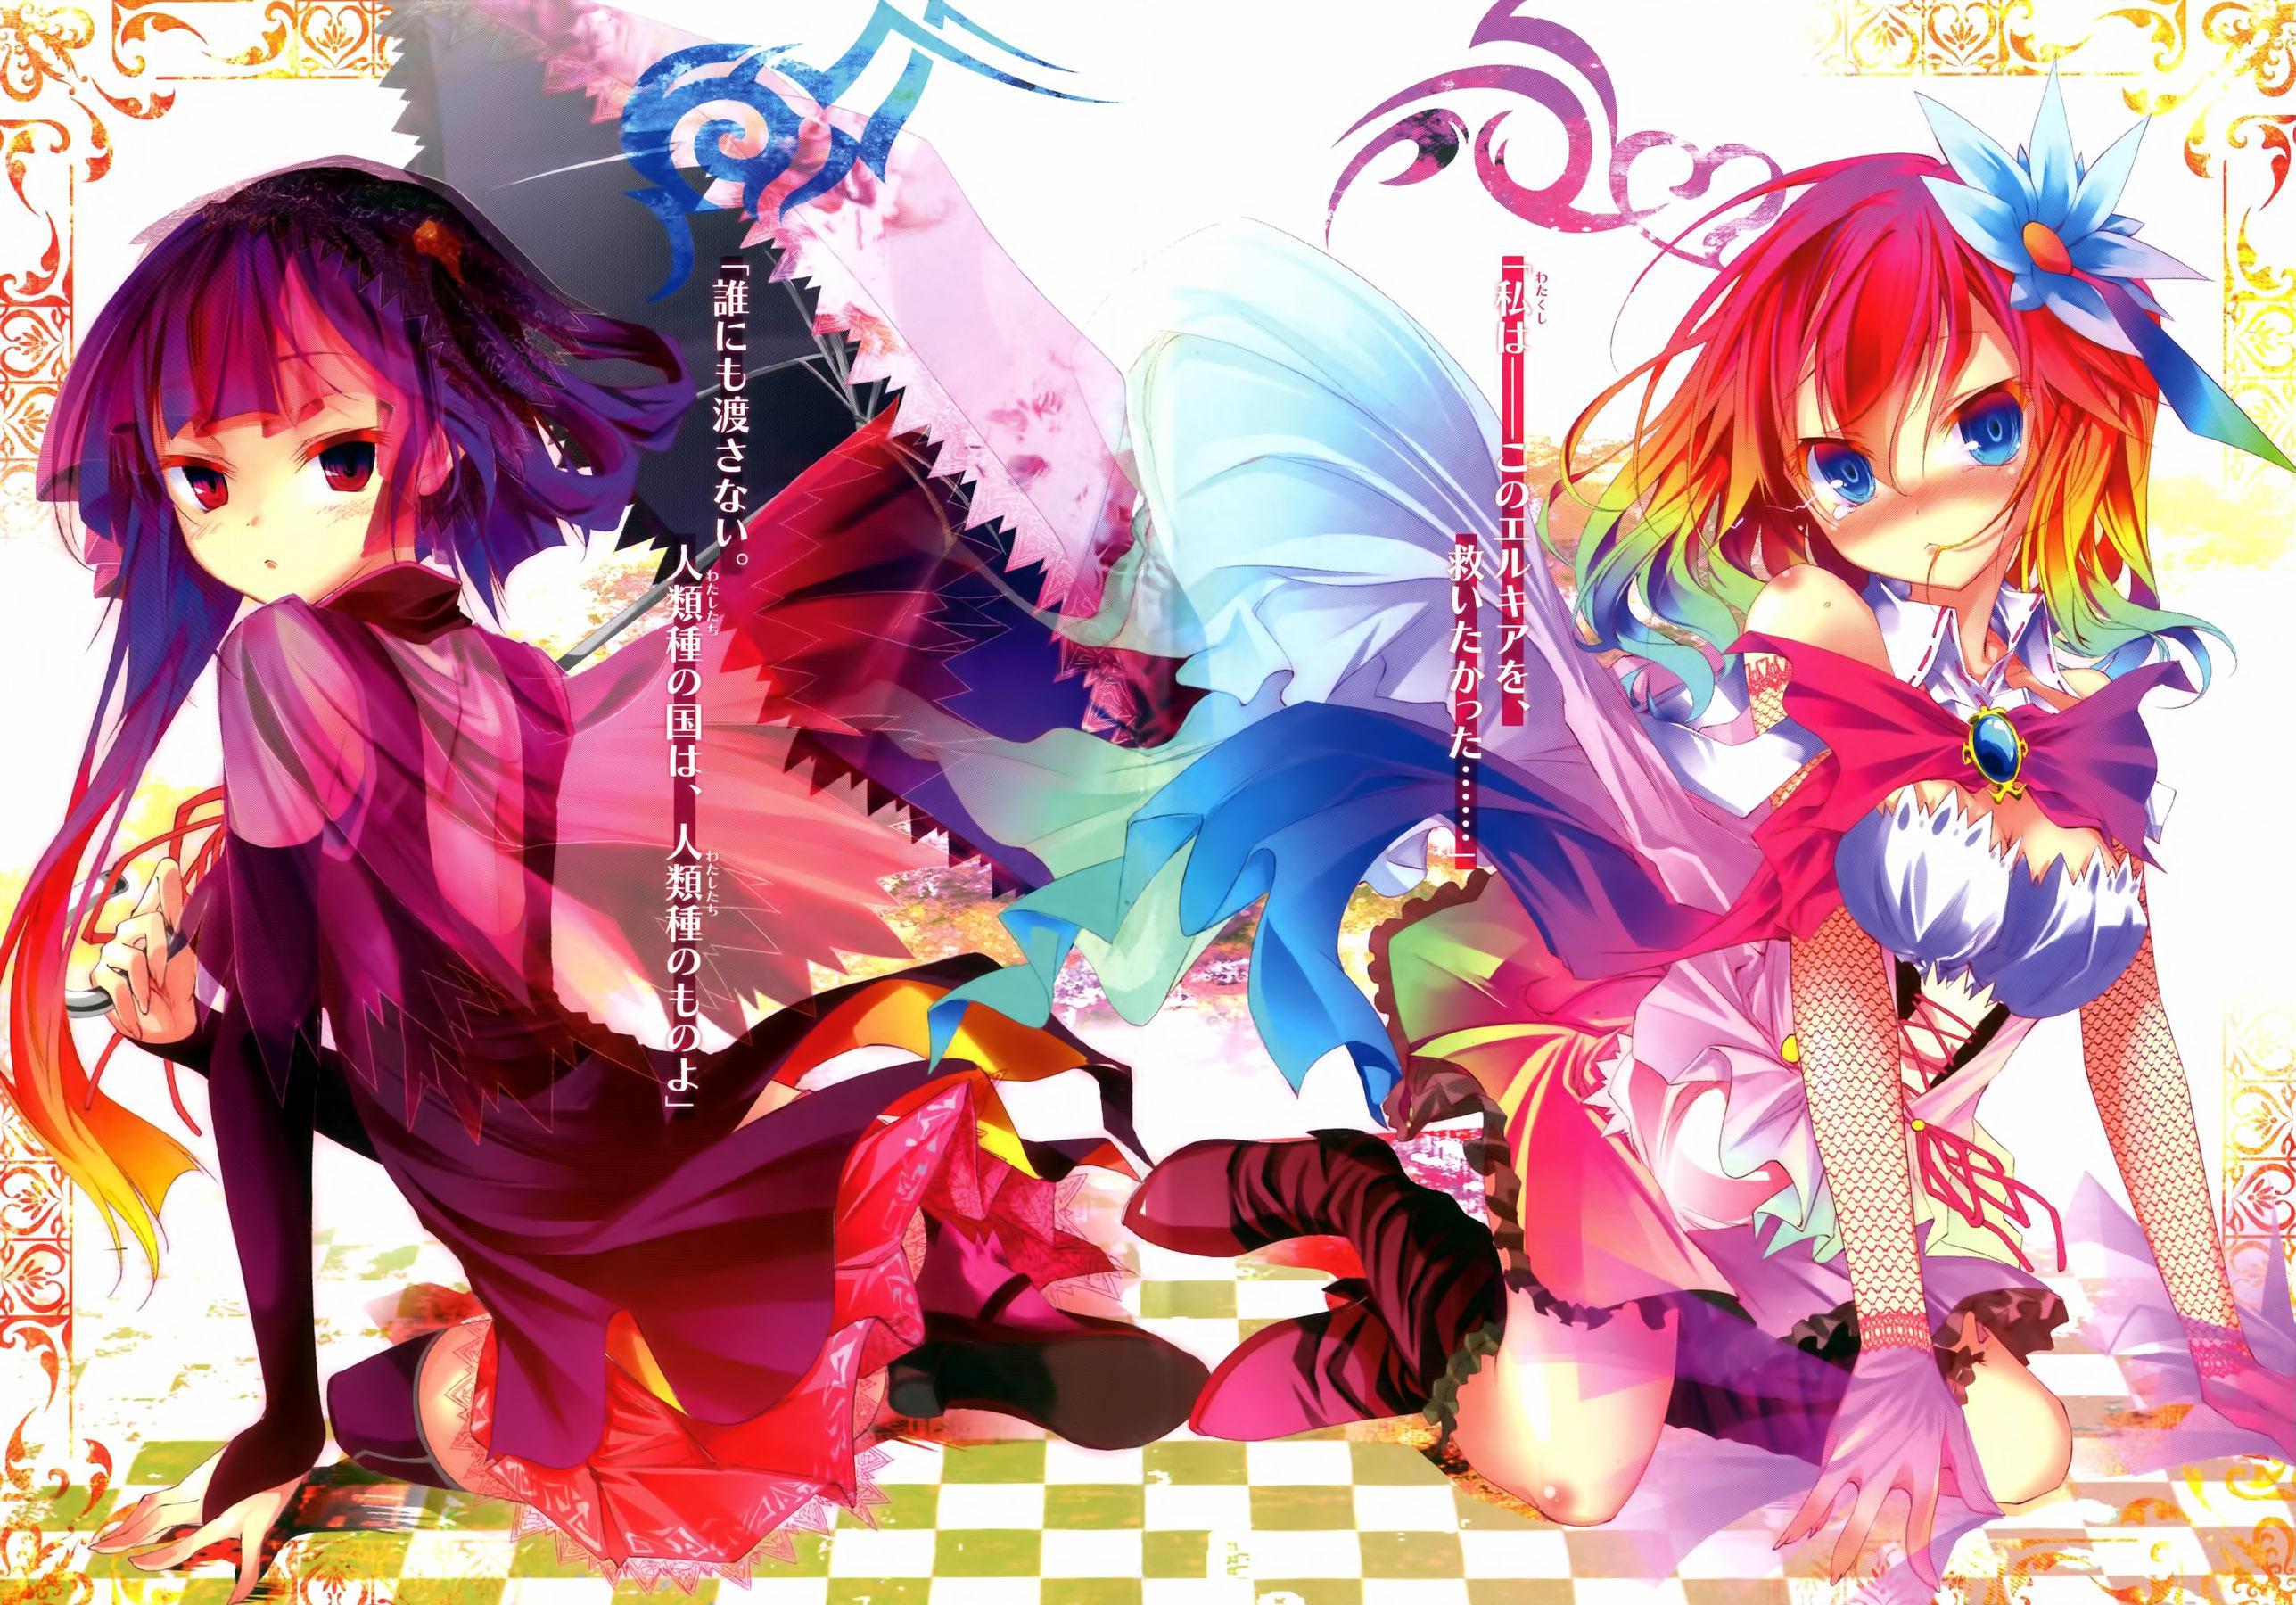 Light Novel Volume 1 No Game No Life Wiki Fandom